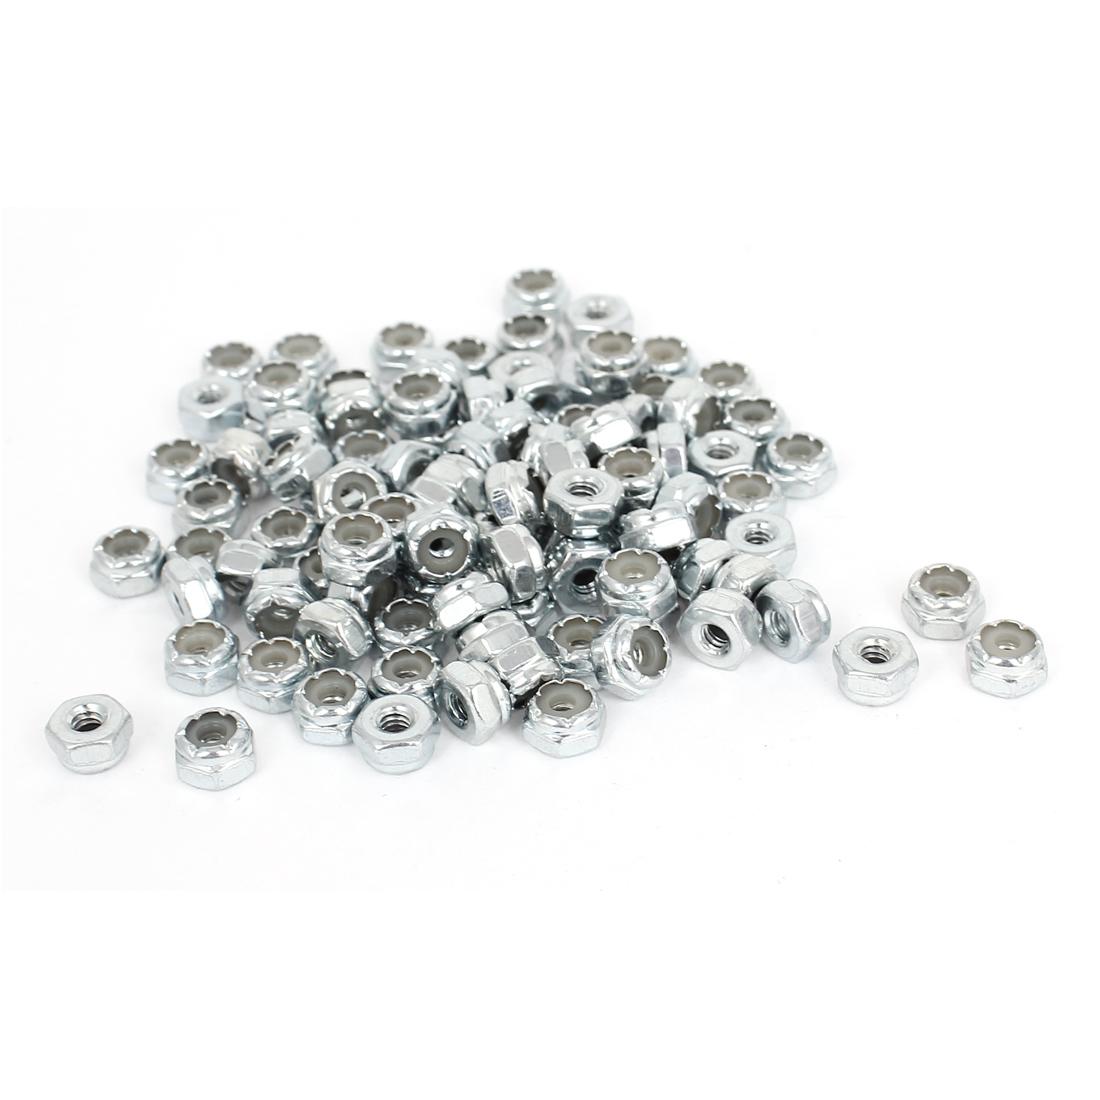 100pcs Zinc Plated Nylock Self-Locking Nylon Insert Hex Lock Nuts #6-32